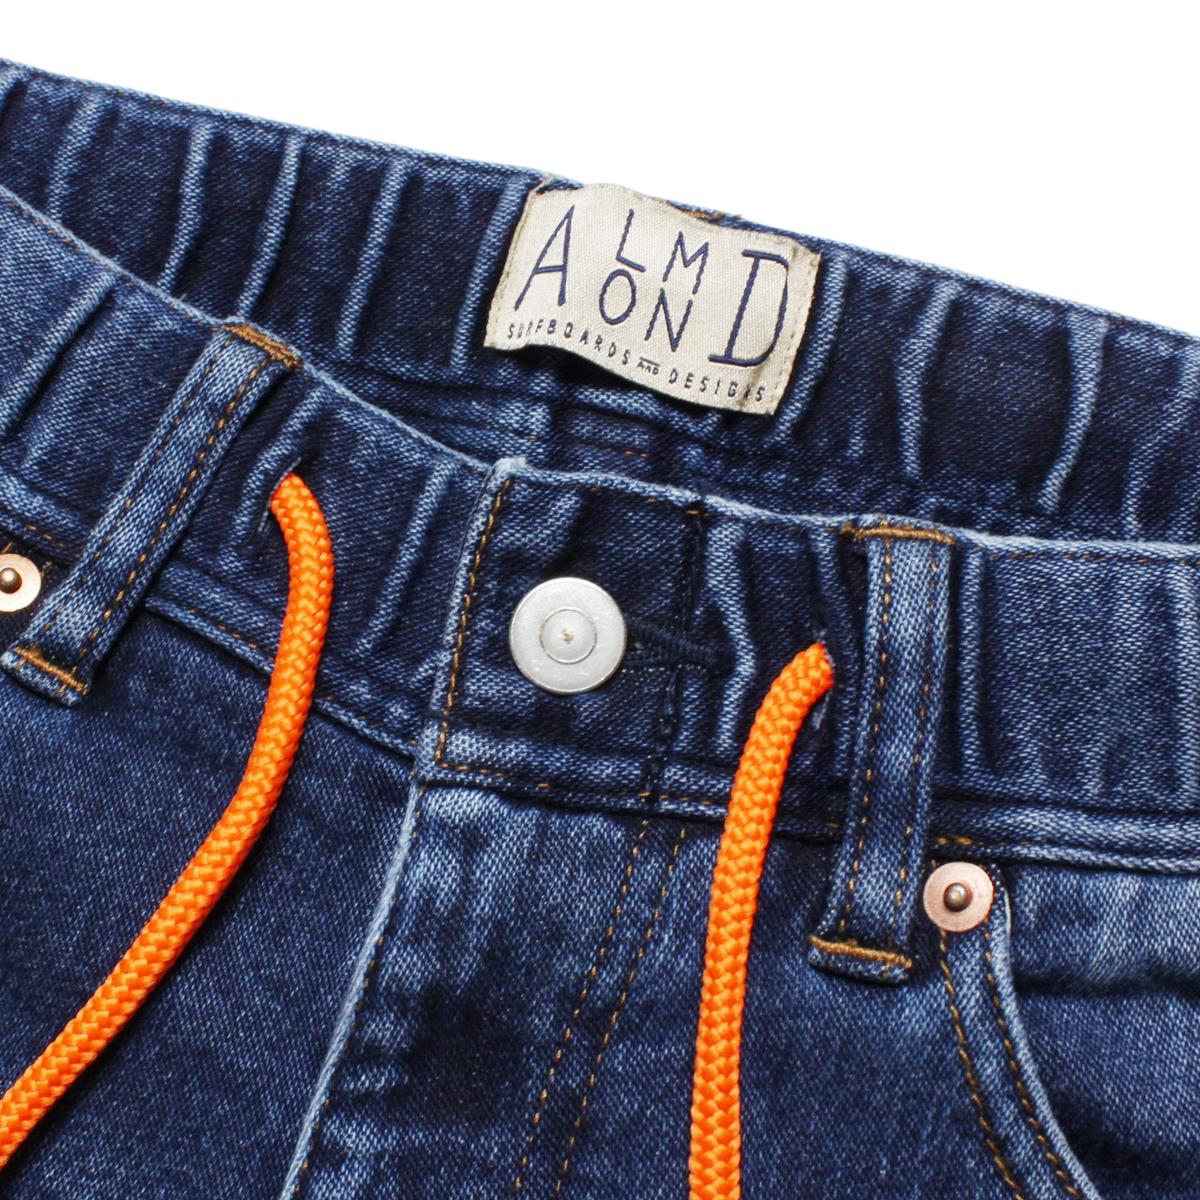 Almond Surf アーモンドサーフボードデザイン ALMOND BASIC JOG PANTS